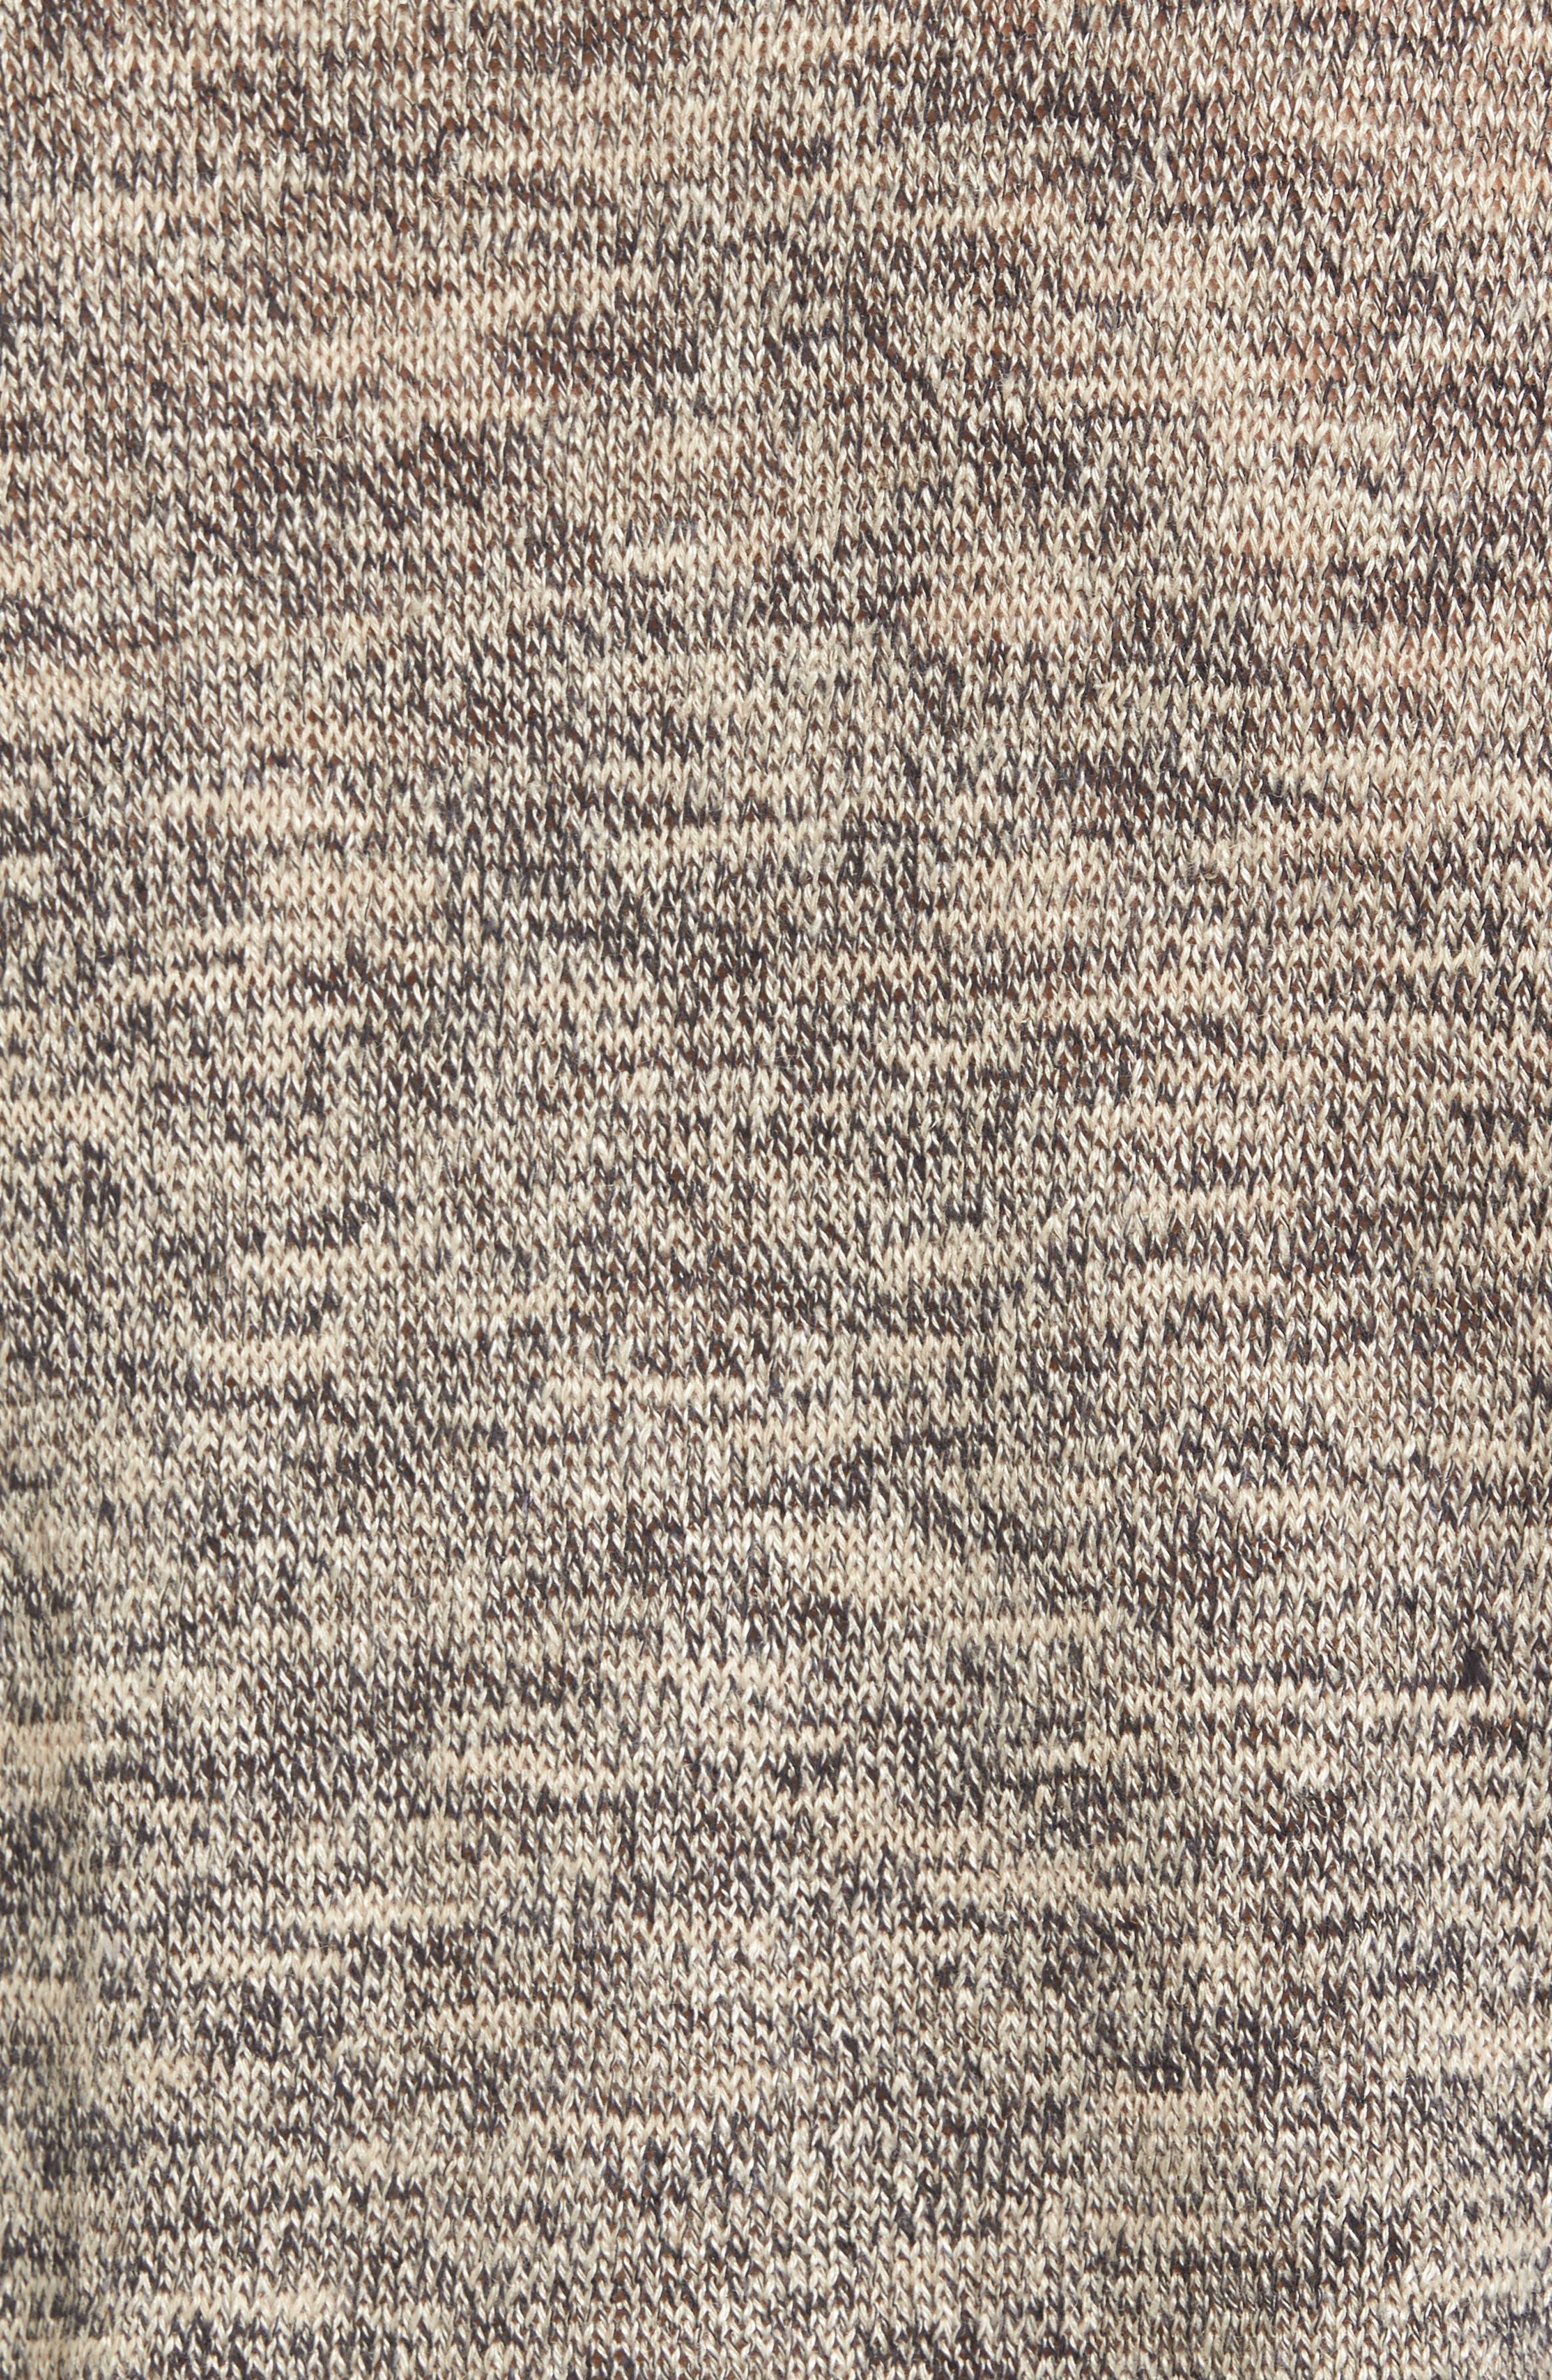 Flora Sweater,                             Alternate thumbnail 5, color,                             Speckled Navy/ Beige